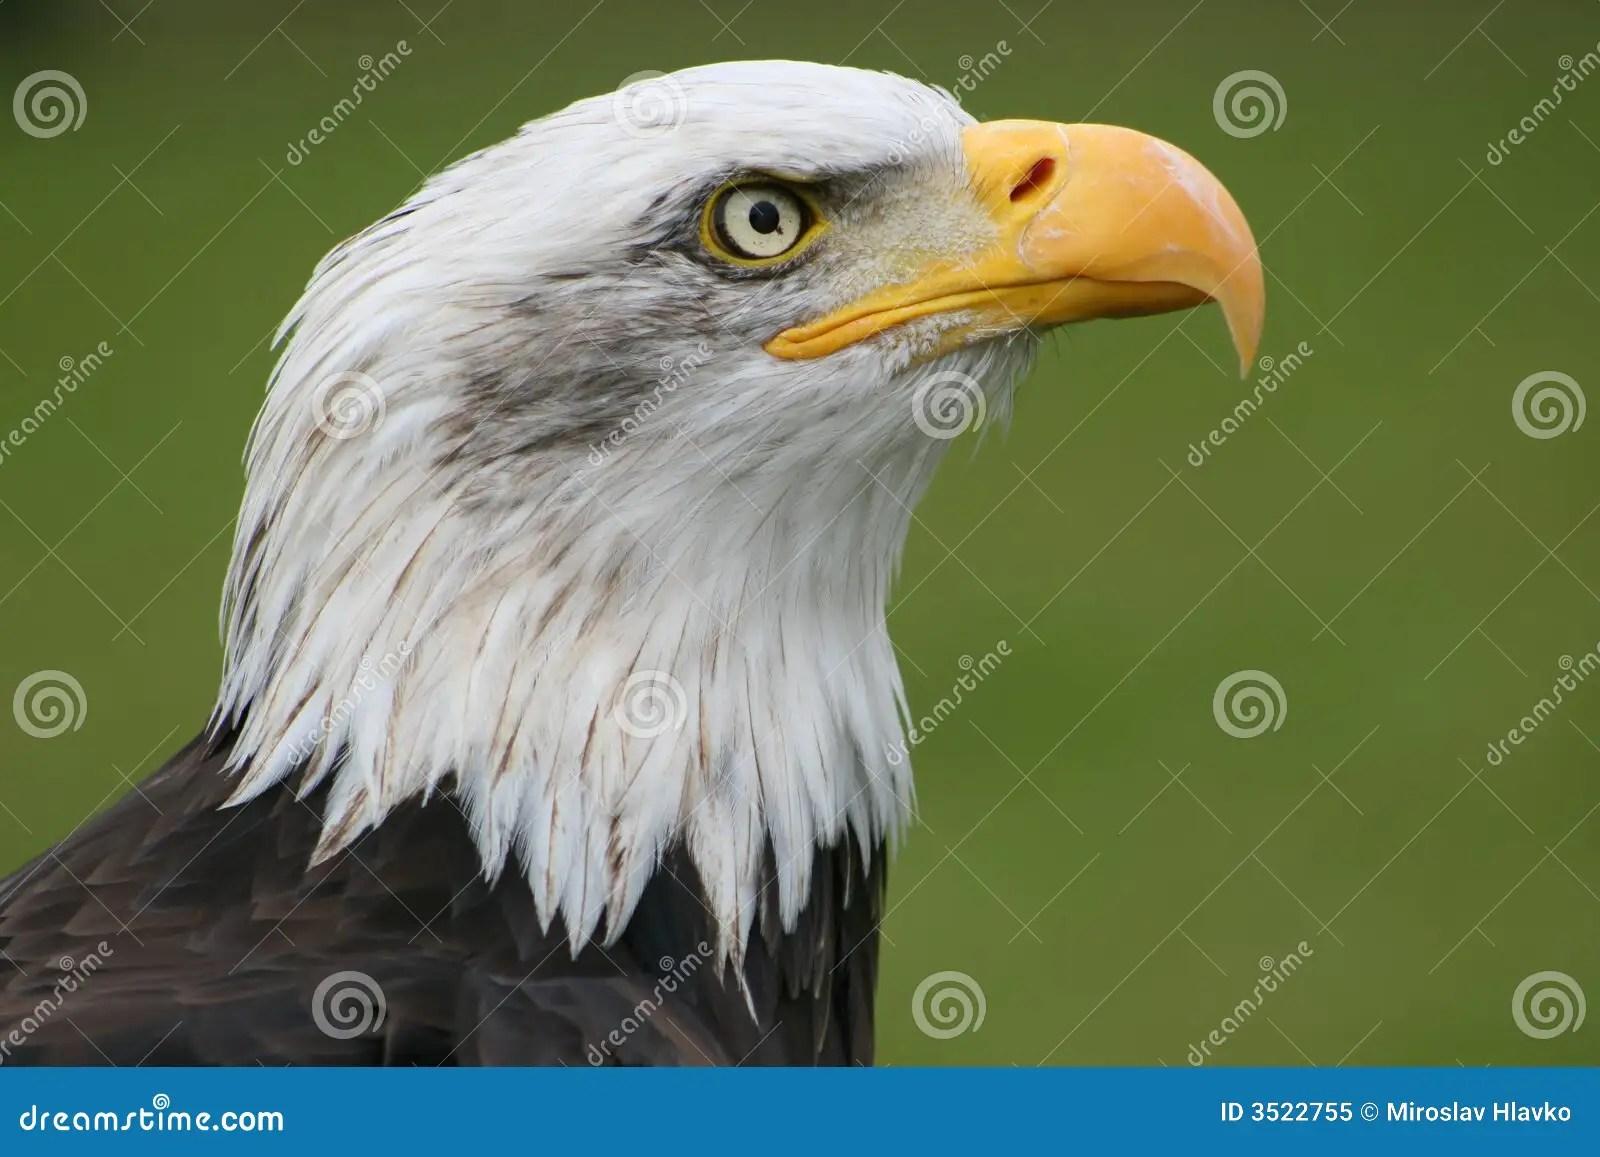 American Bald Eagle Feather